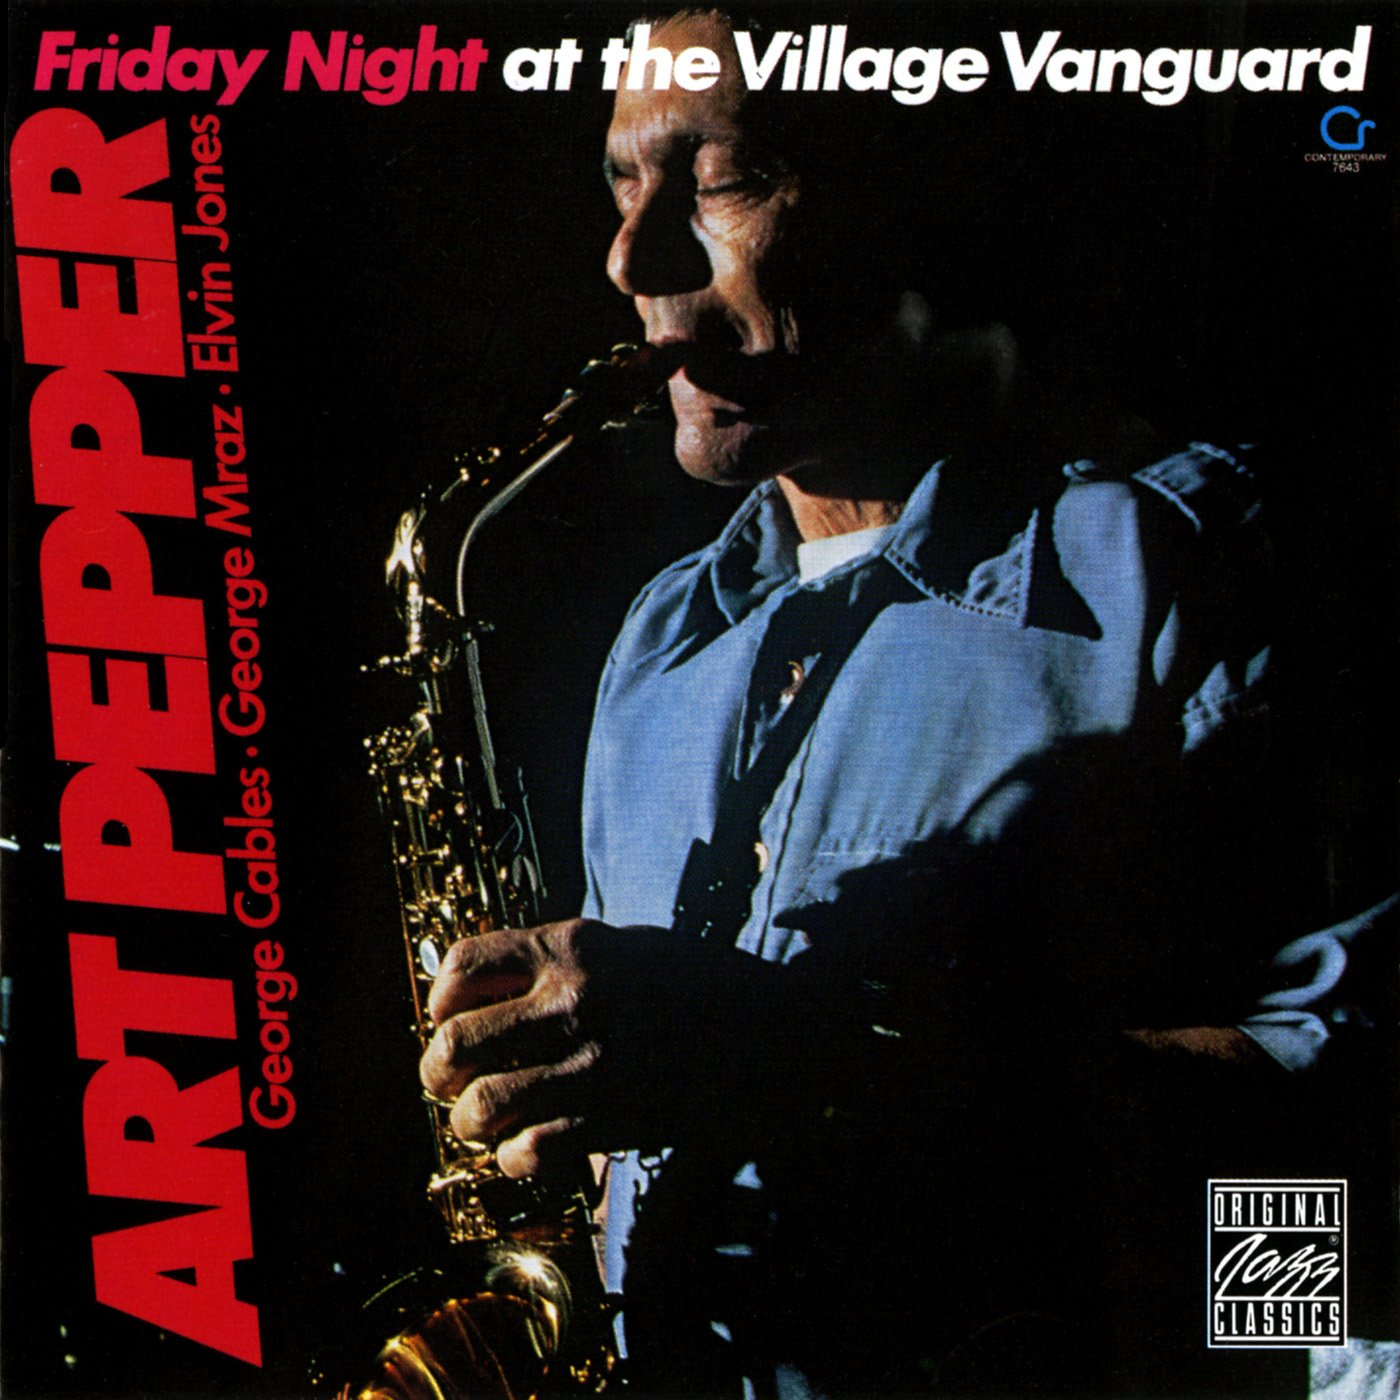 Art Pepper - Friday Night At Village Vanguard - Amazon.com Music